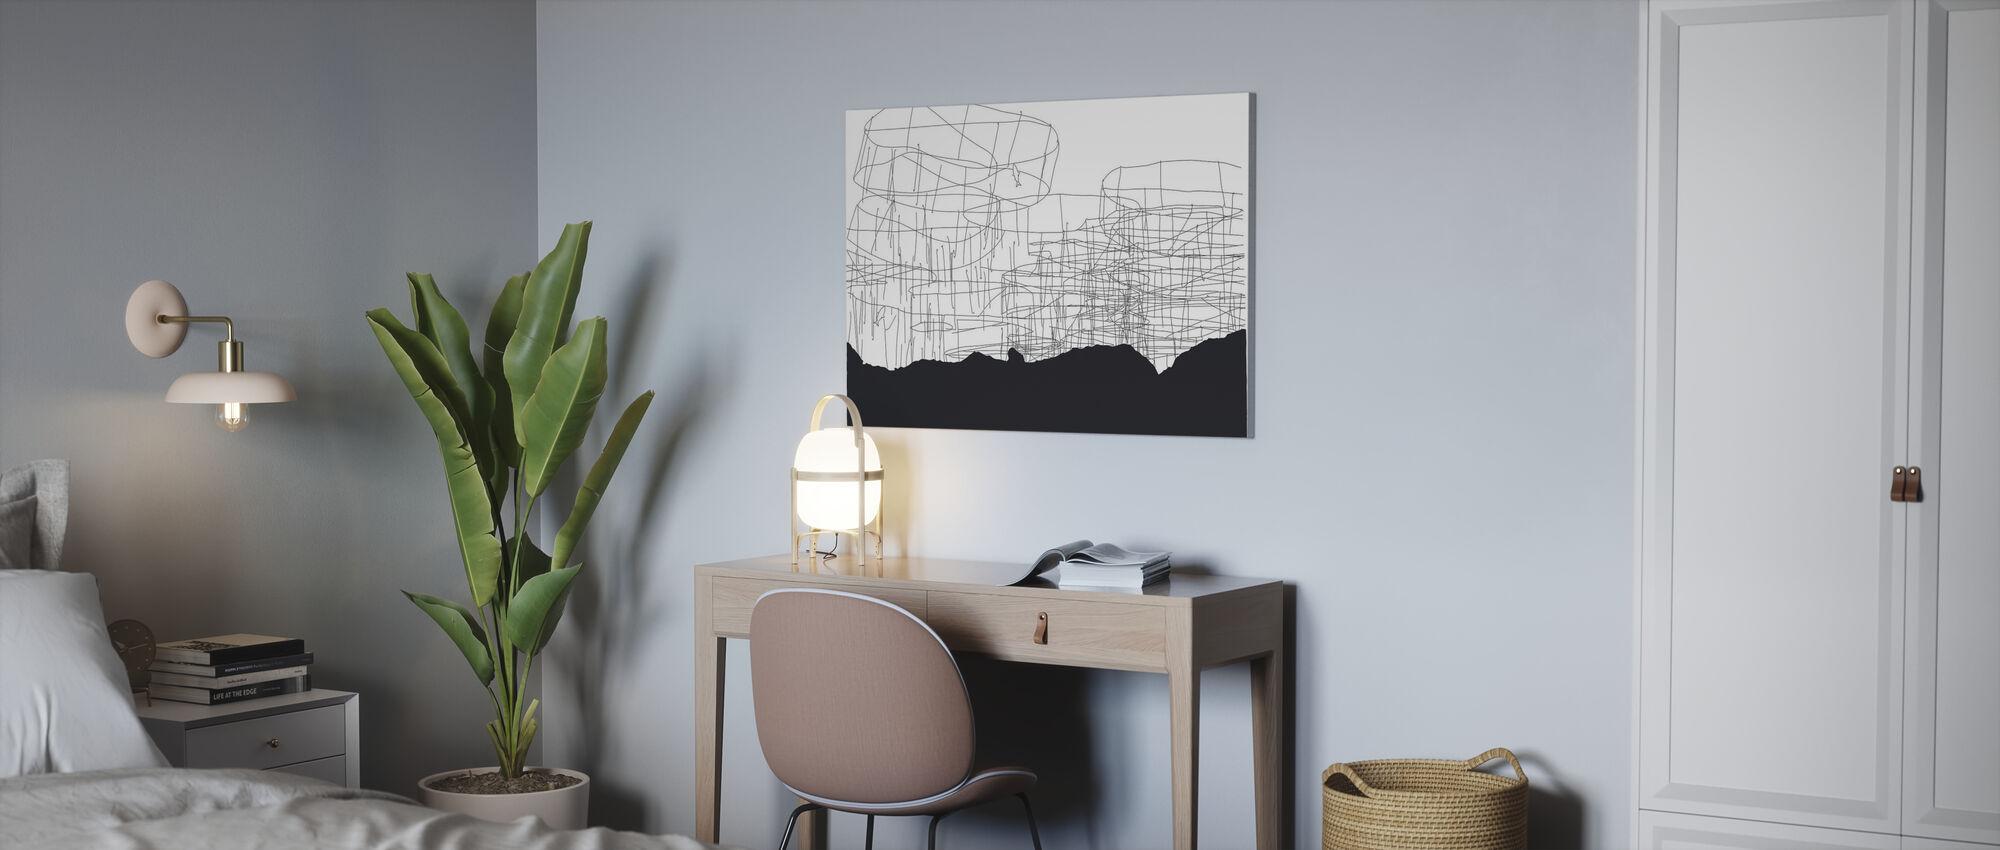 Harbour Fish - Canvas print - Office